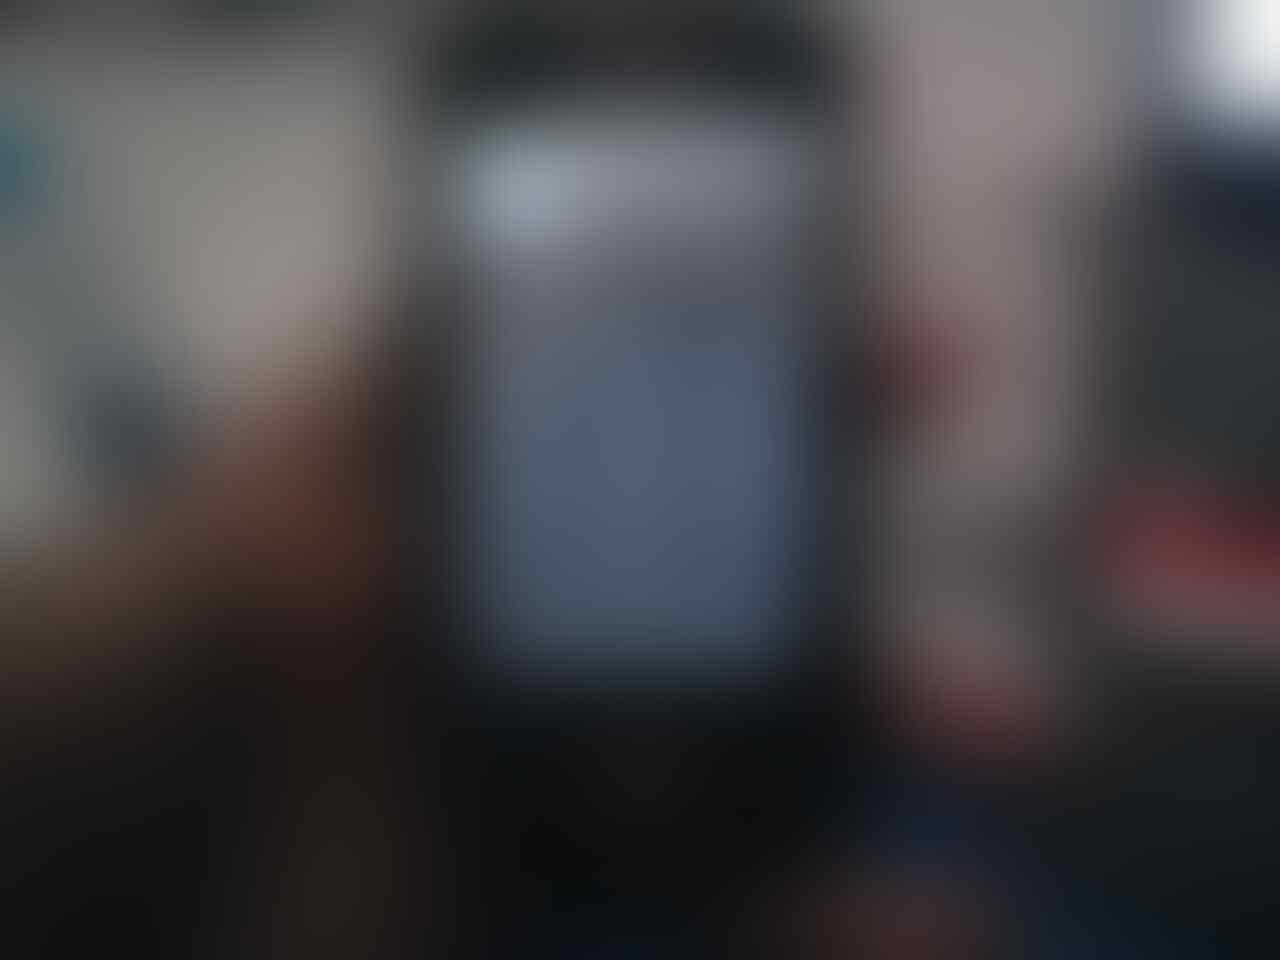 [Jual Cepat BU] Samsung Galaxy Spica I5700 Black Mulus